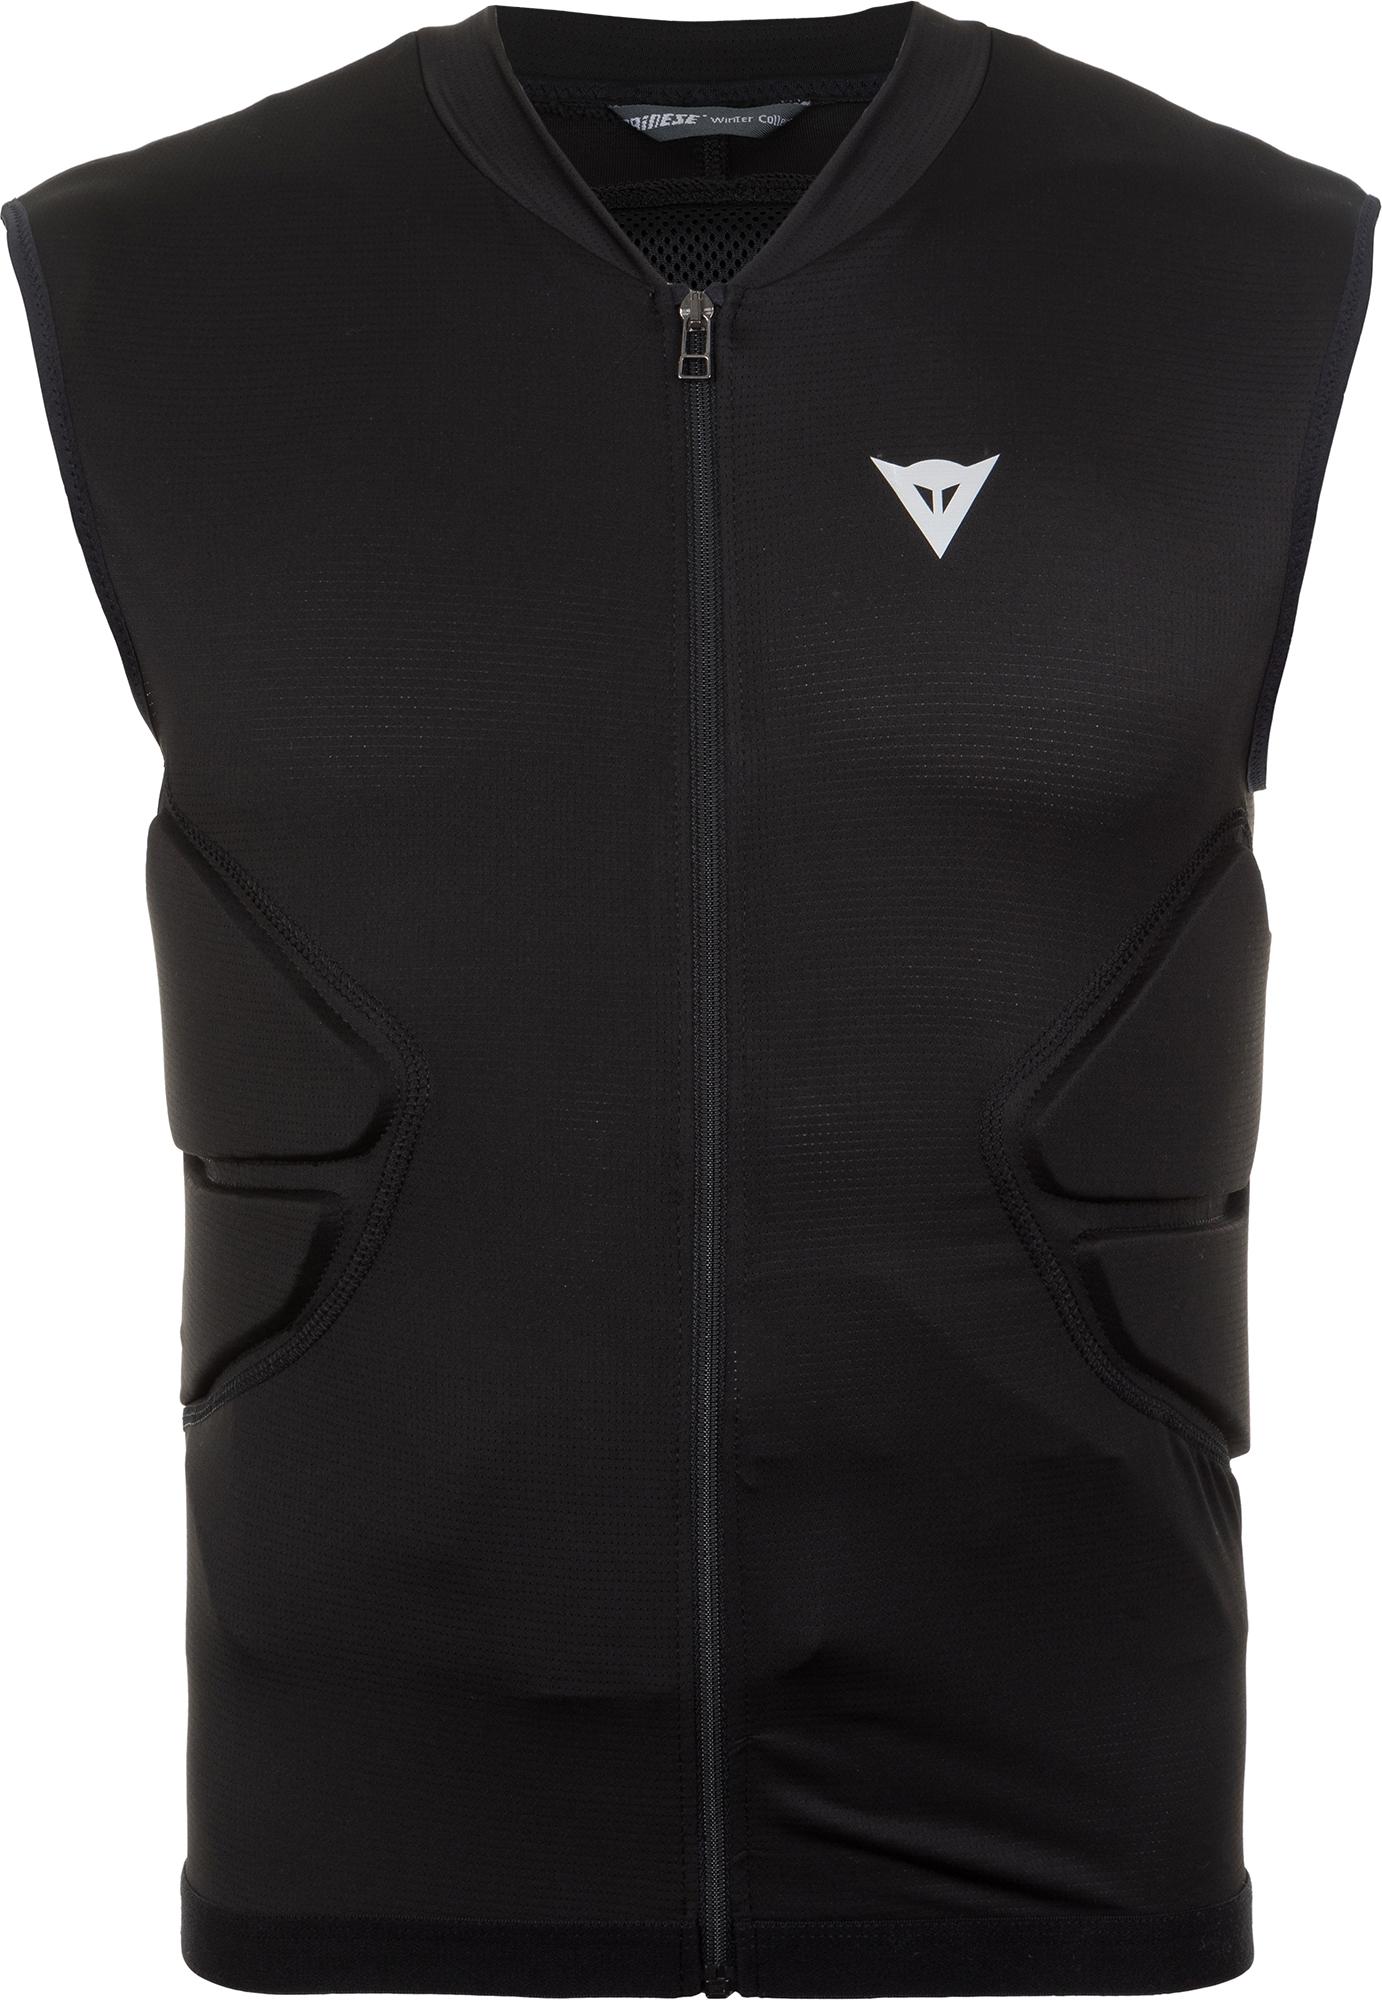 цена на Dainese Жилет защитный Dainese Flexagon Waistcoat